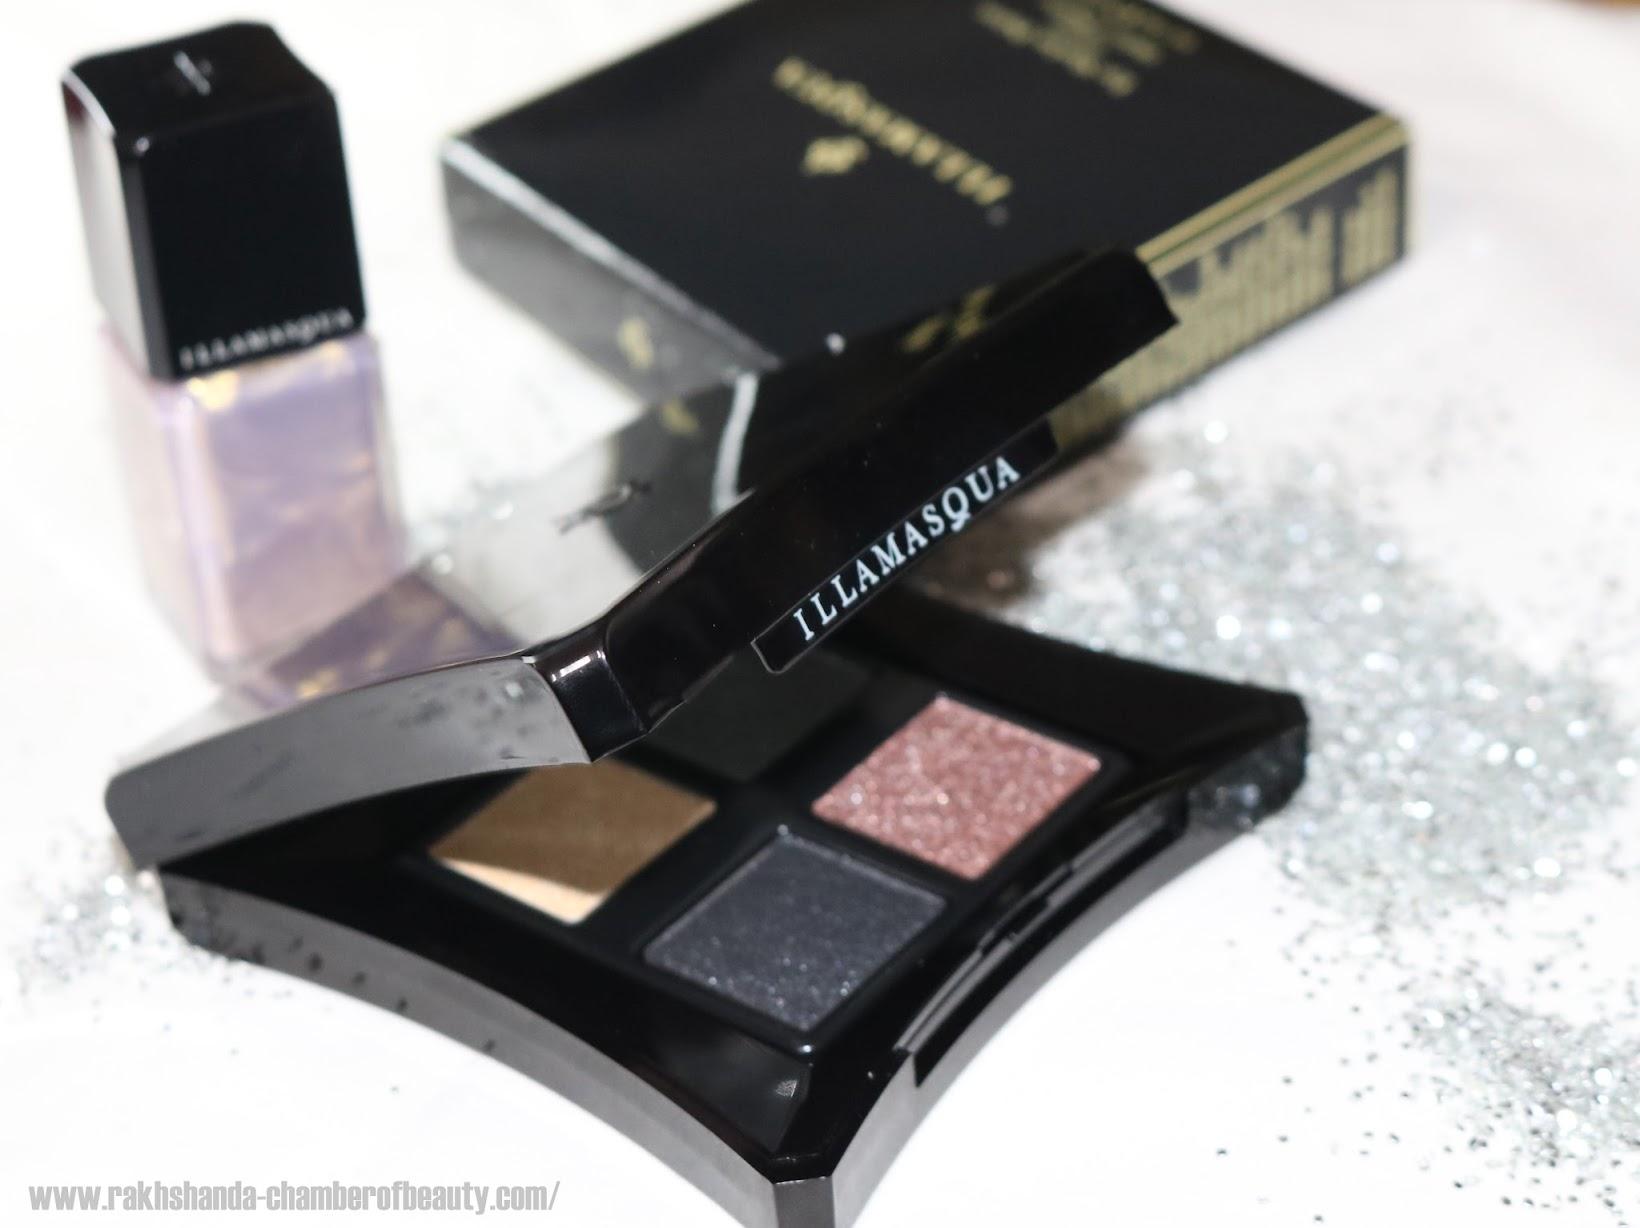 Illamasqua Equinox Collection For Christmas 2015- Review, swatches and more, Illamasqua celestial Palette, Illamasqua Nail Varnish Beam, Indian beauty blogger